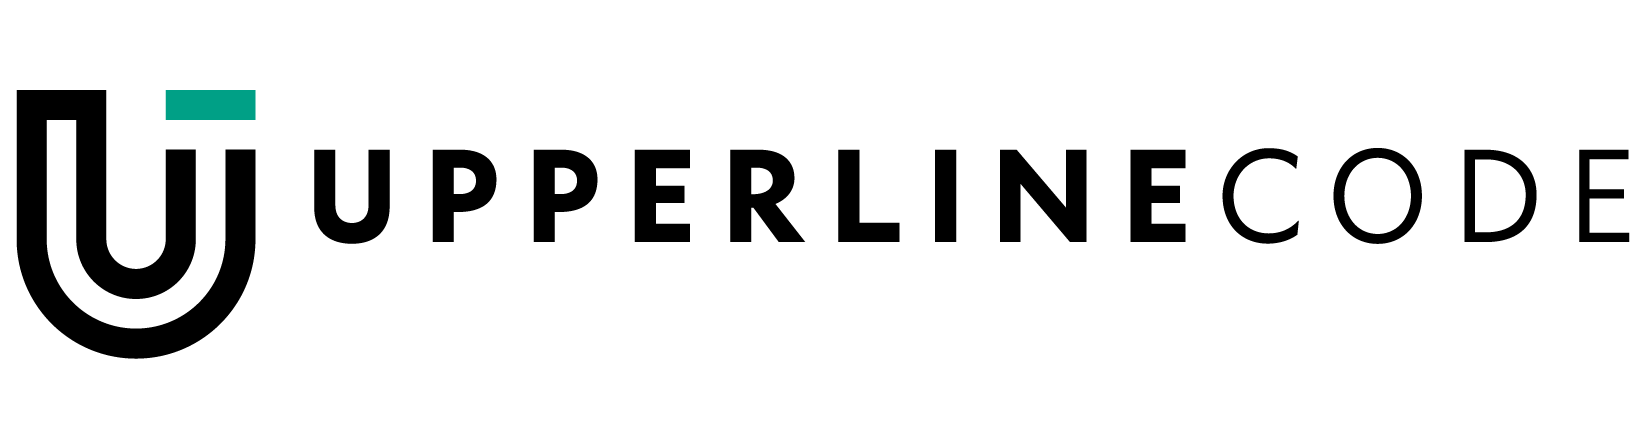 uc_logo_cropped-main.png